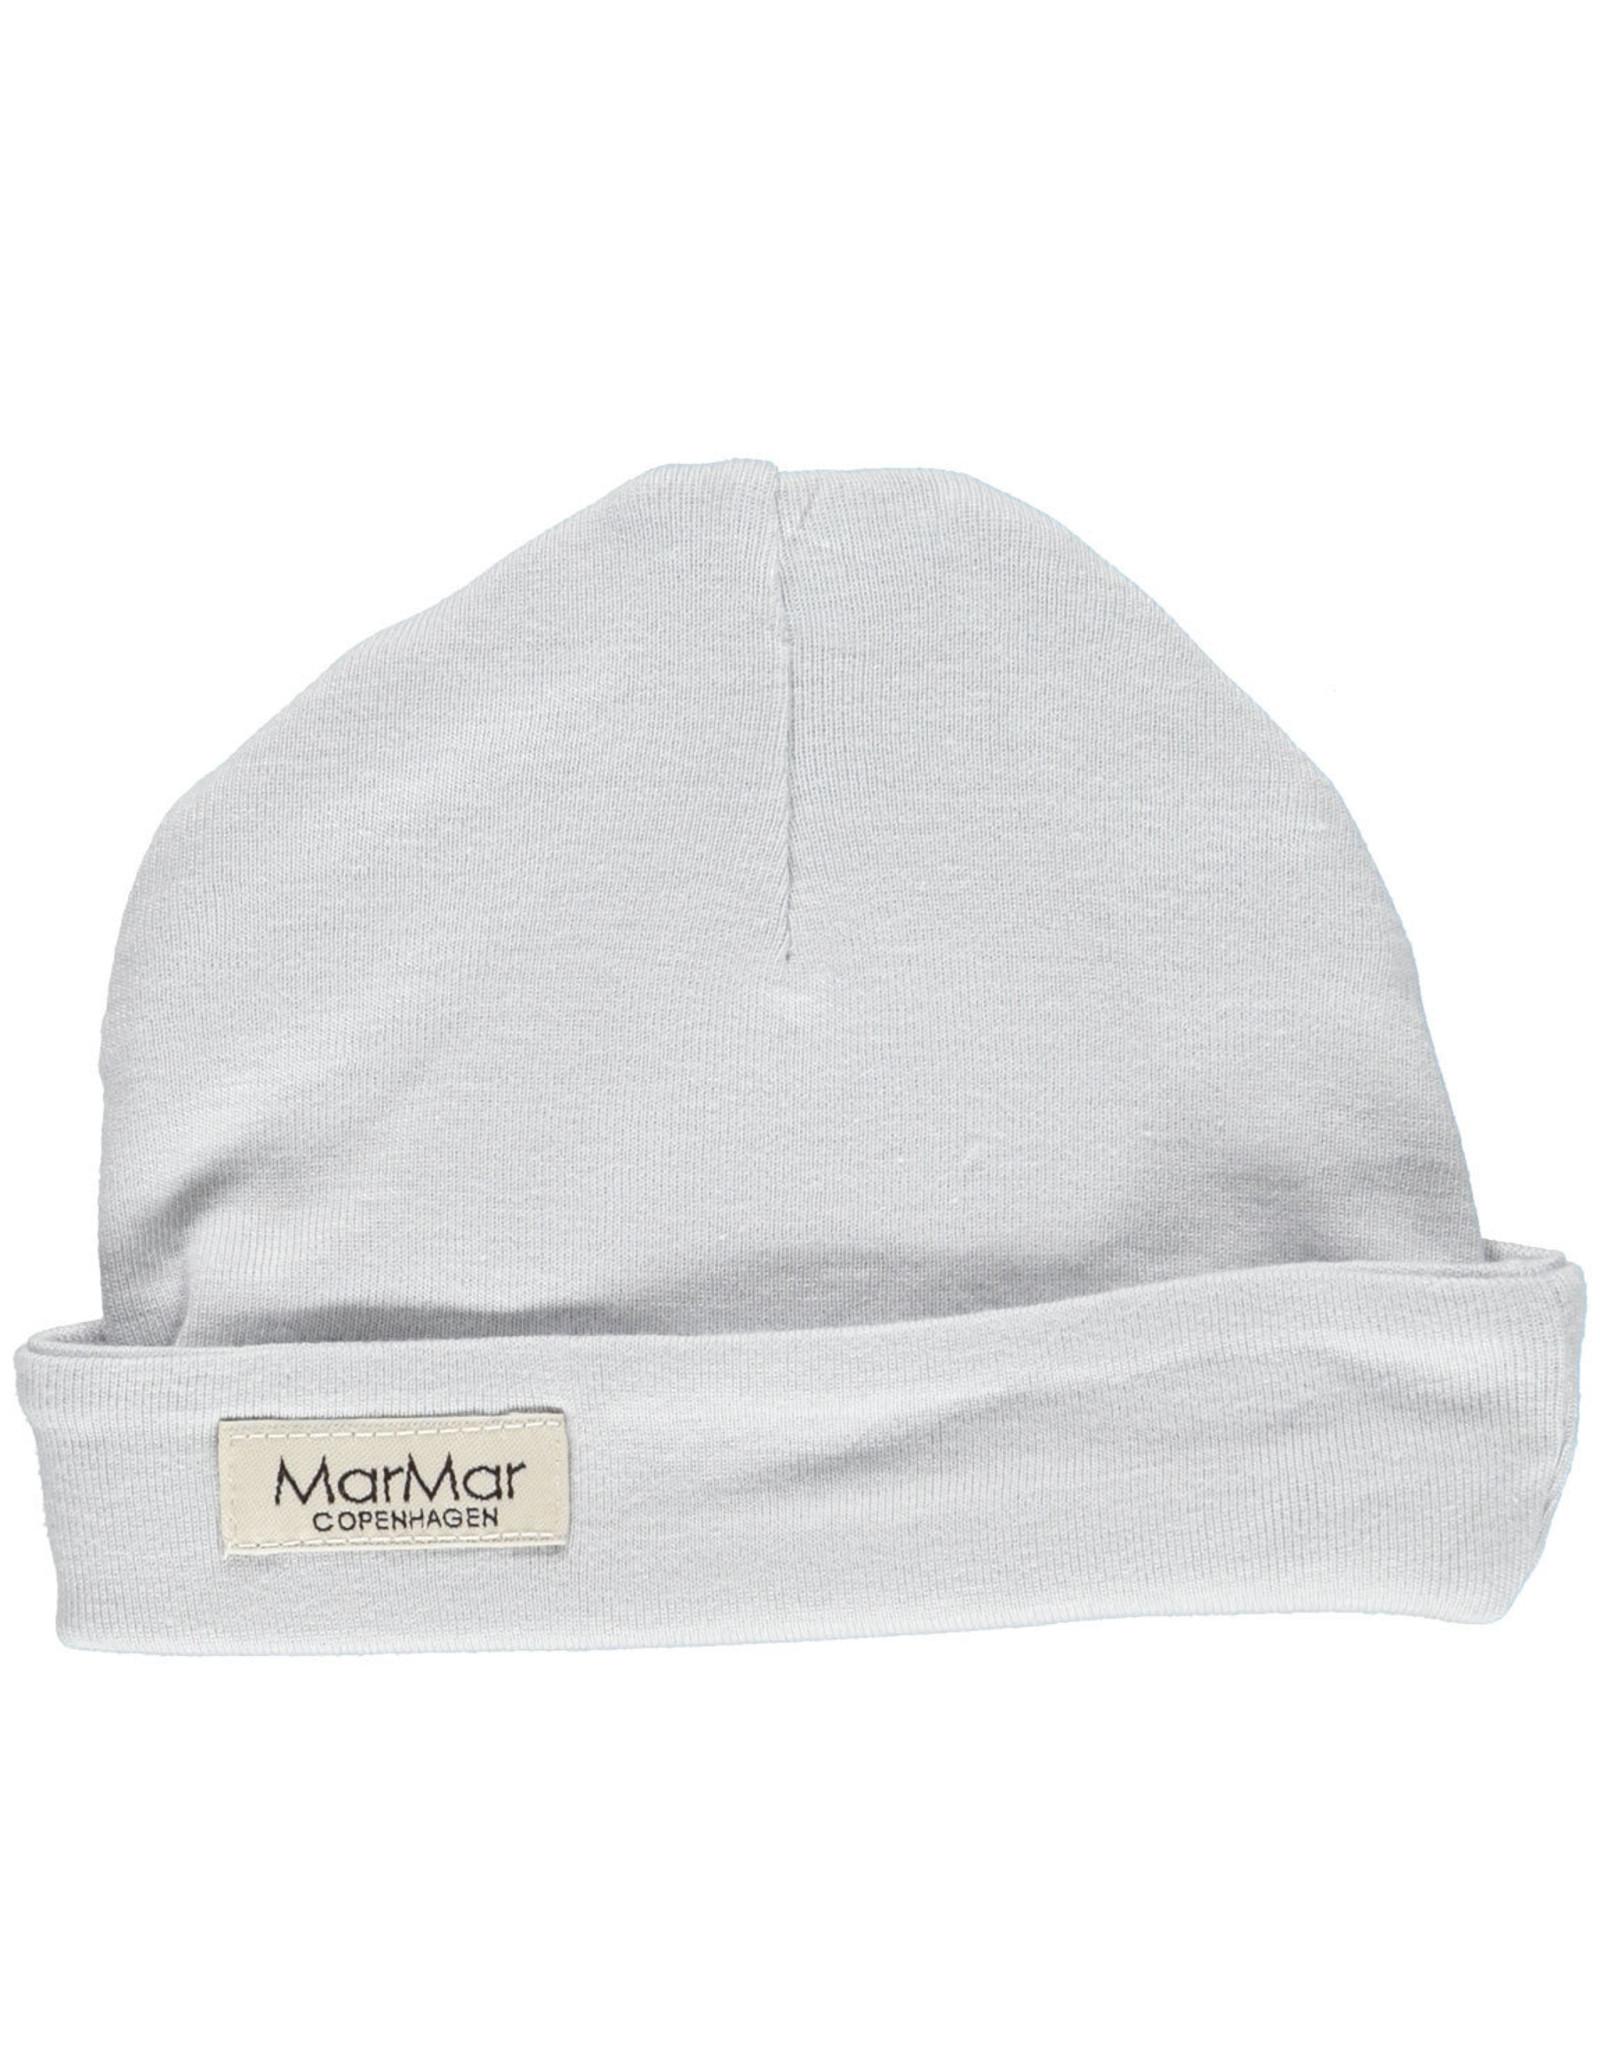 MARMAR COPENHAGEN Pale Blue Aiko Hat